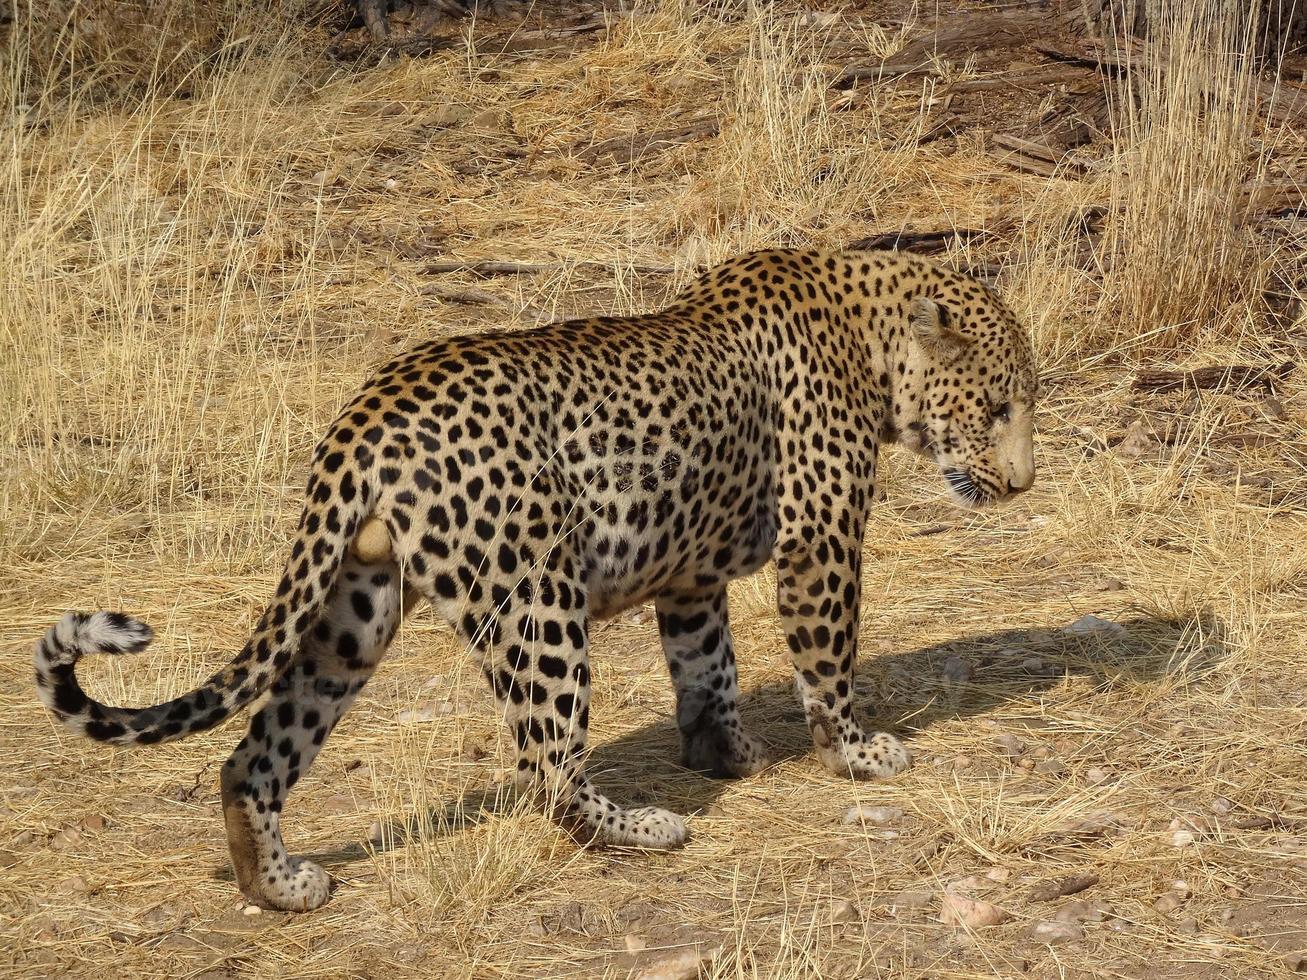 maravilloso leopardo caminando foto